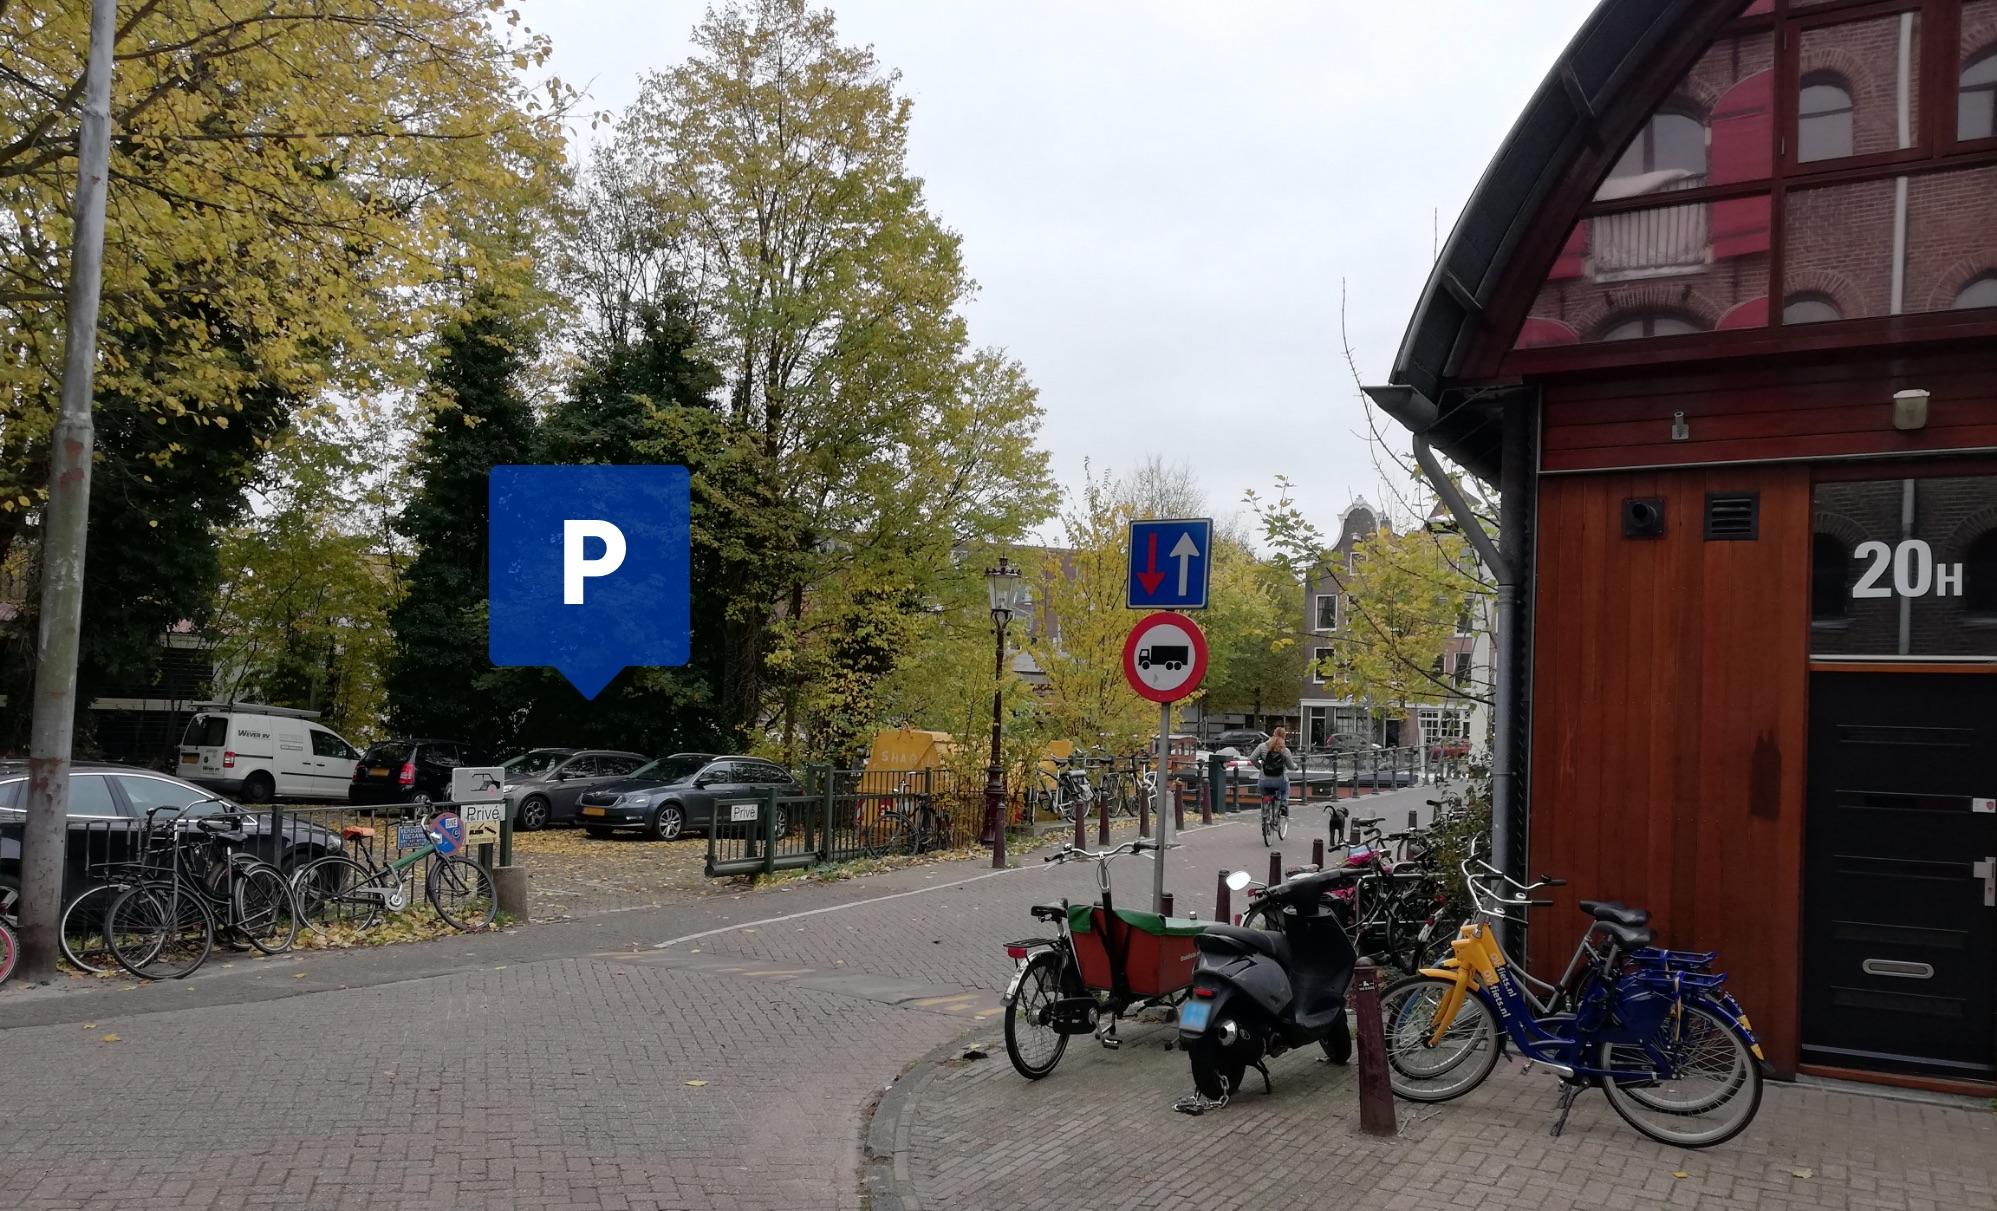 CapeRock parking